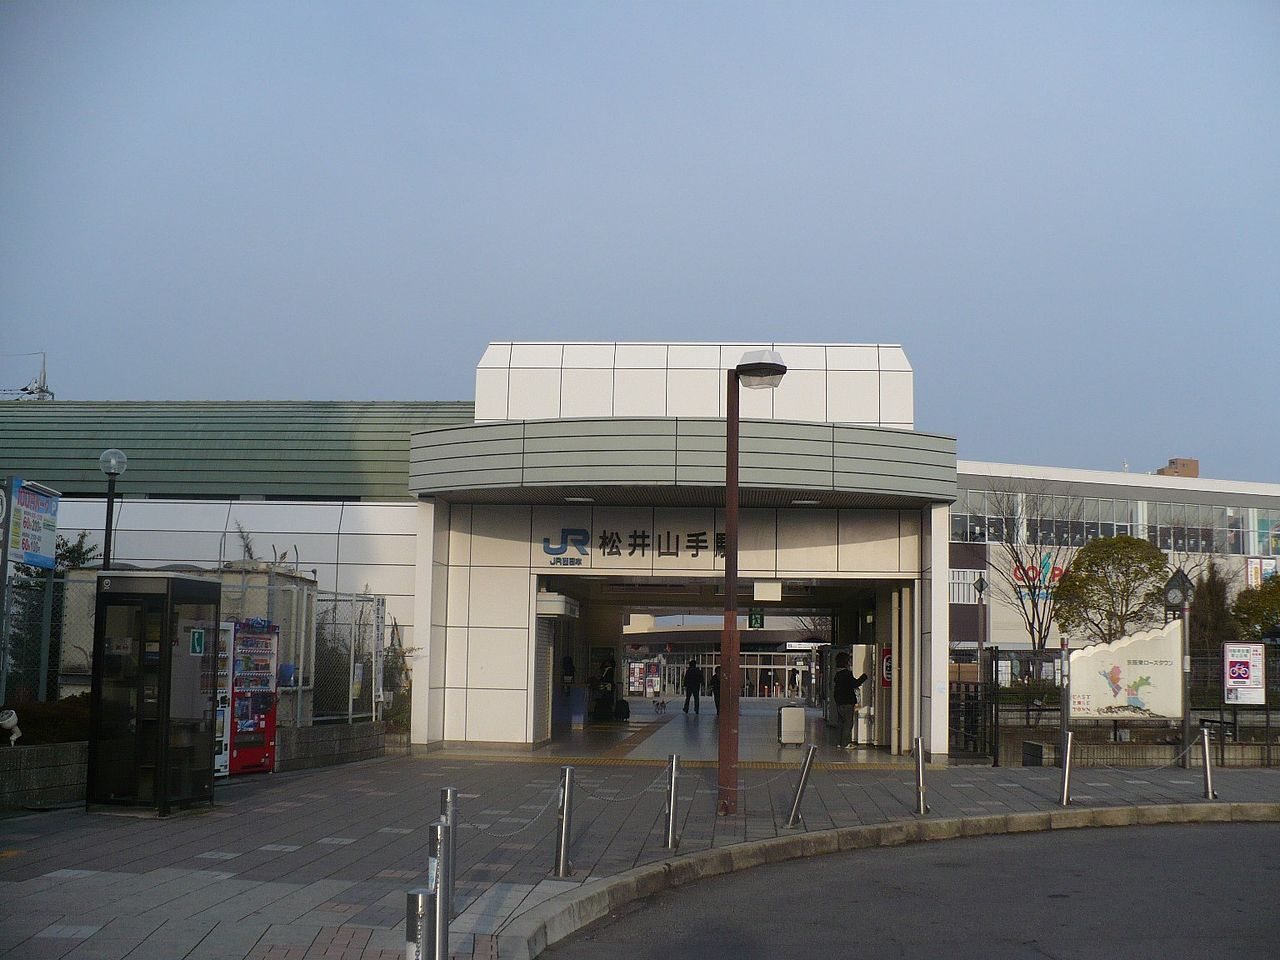 1280px matsuiyamate station frontview